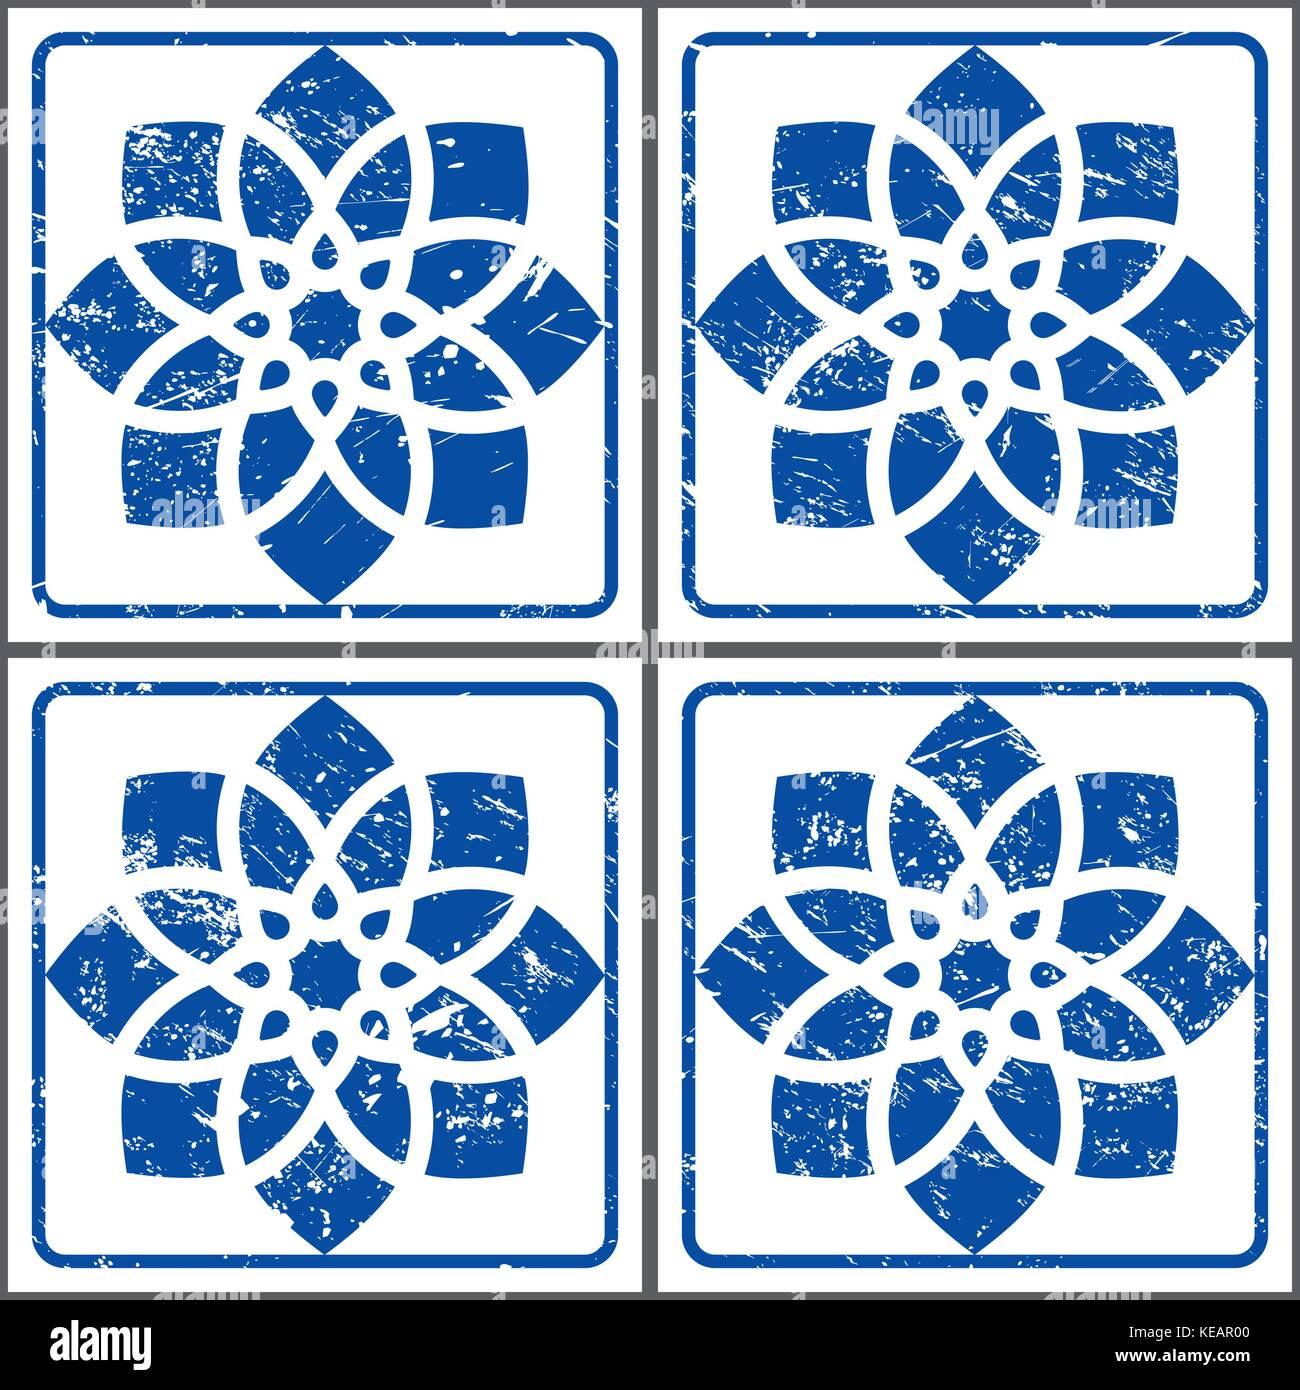 Azulejos retro vector tiles pattern, Portuguese seamless blue tiles design, Geometric ceramics - Stock Vector